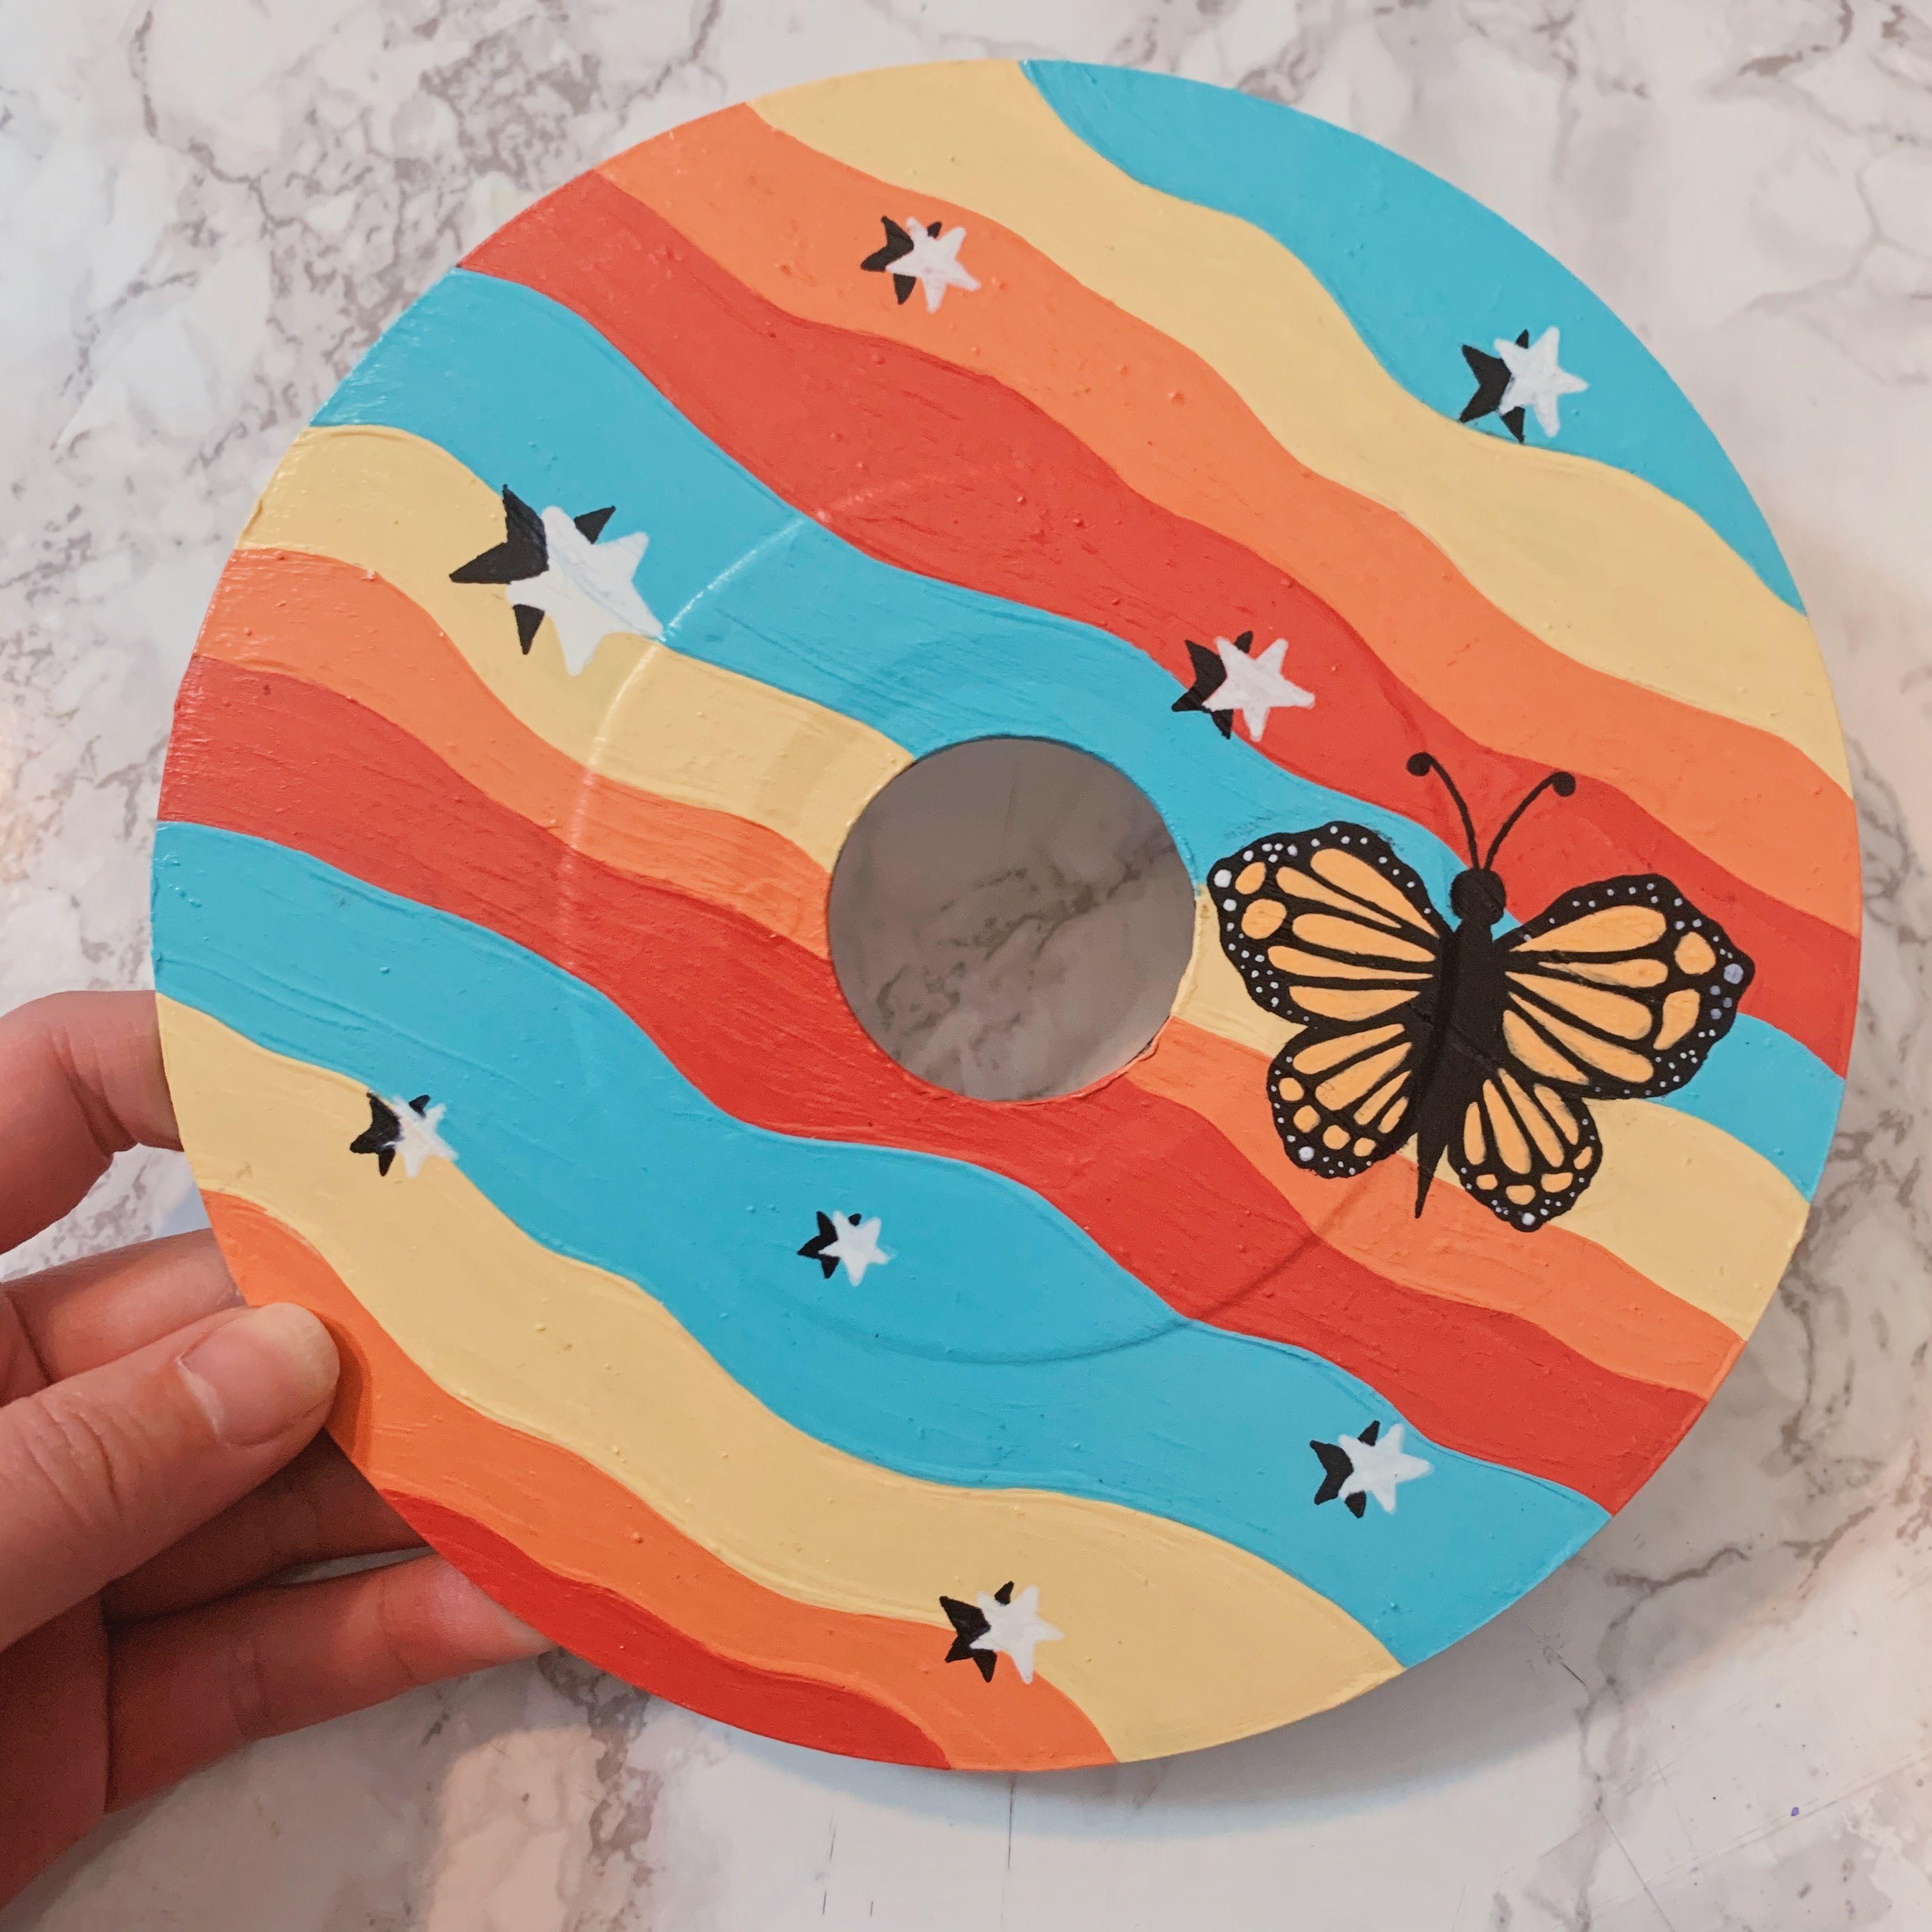 Wall Walldecor Wallart Records Vintage Vinyl Vinylrecords Painting Aesthetic Posca Poscapaint Posc In 2020 Diy Art Painting Vinyl Art Paint Painting Crafts